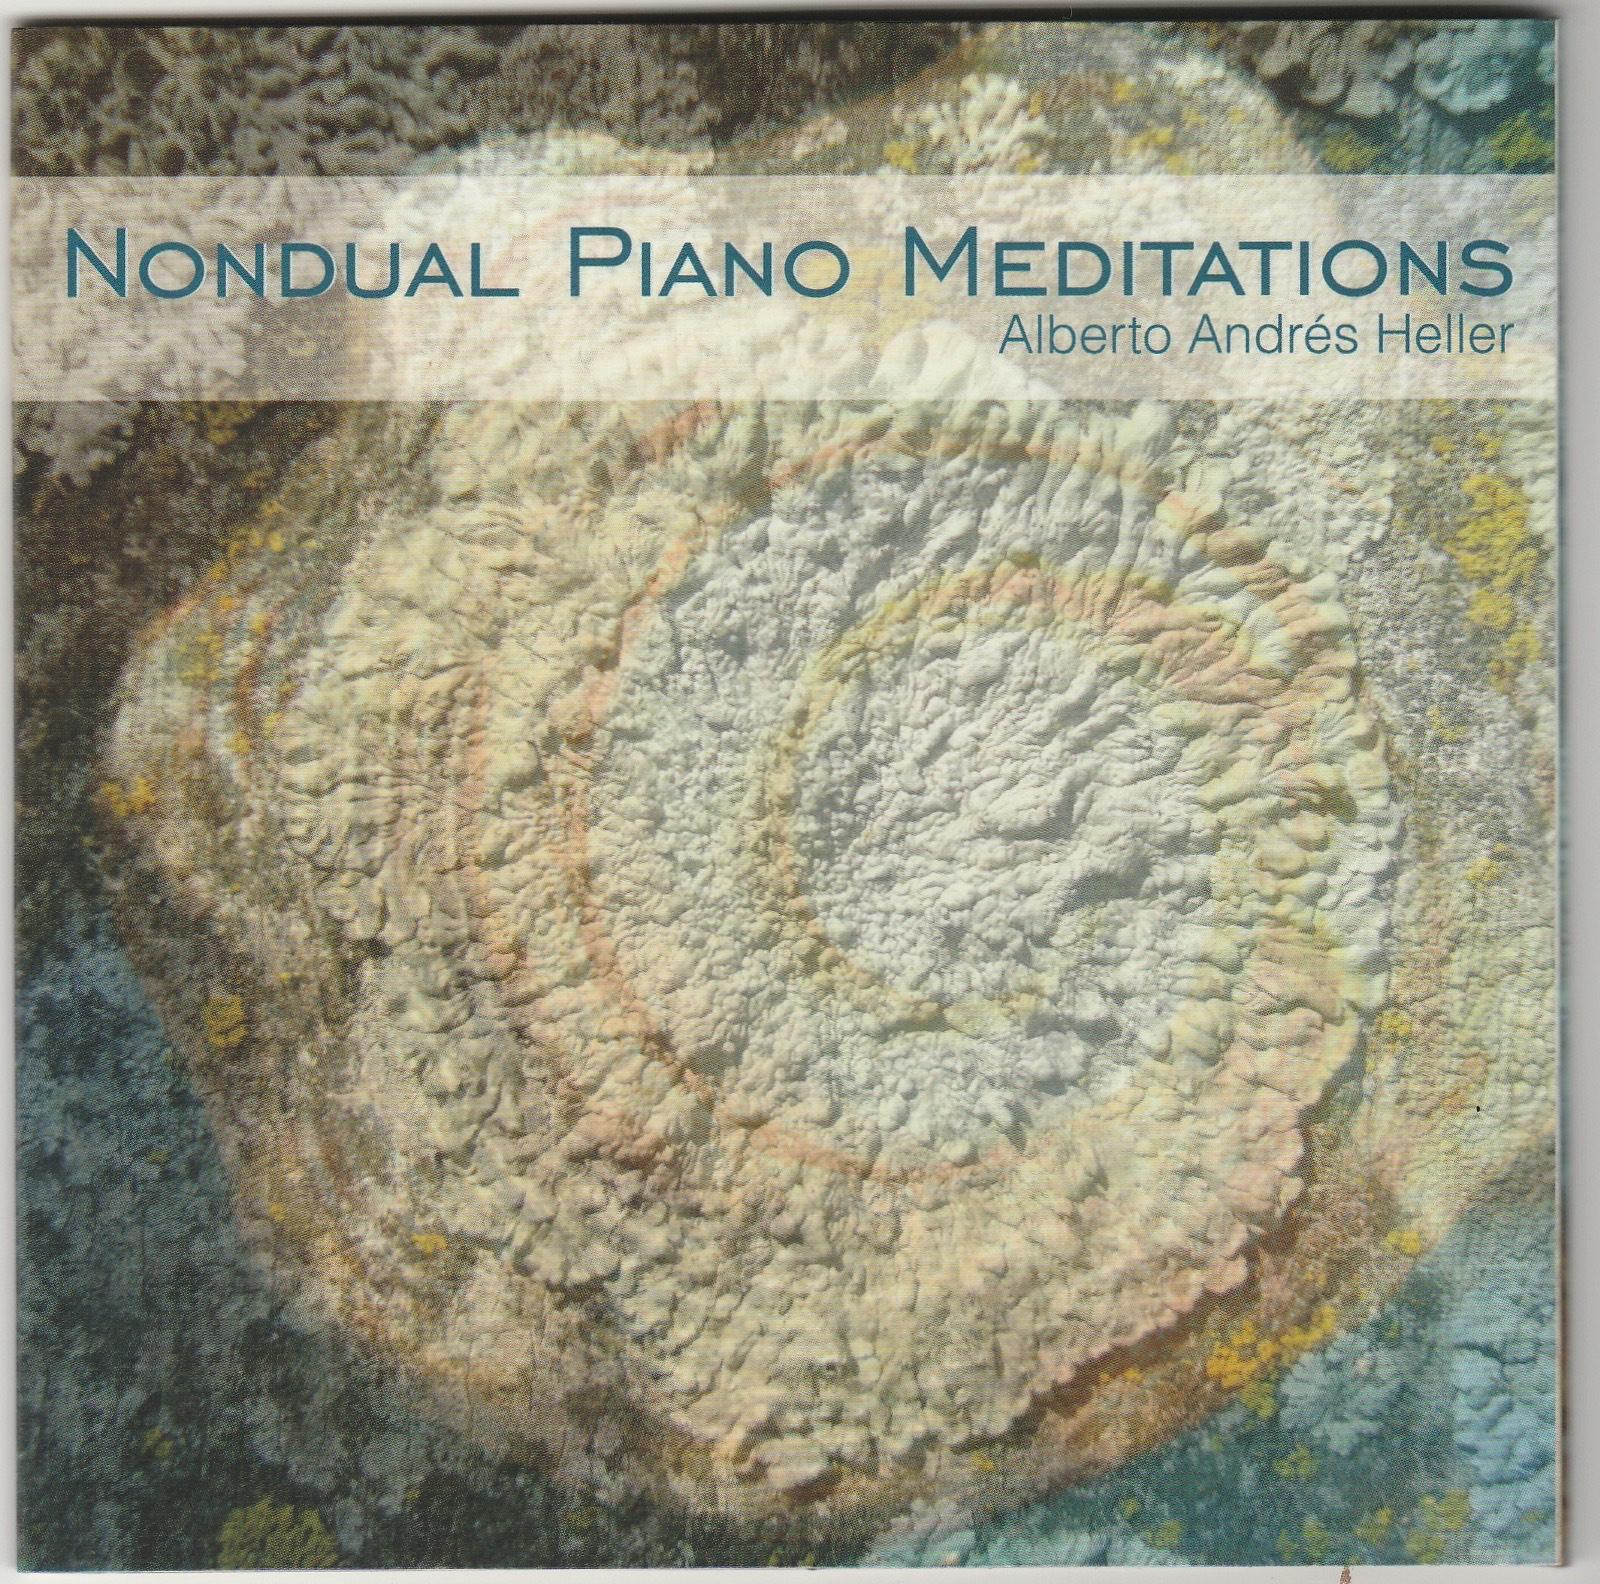 Nondual Piano Meditations